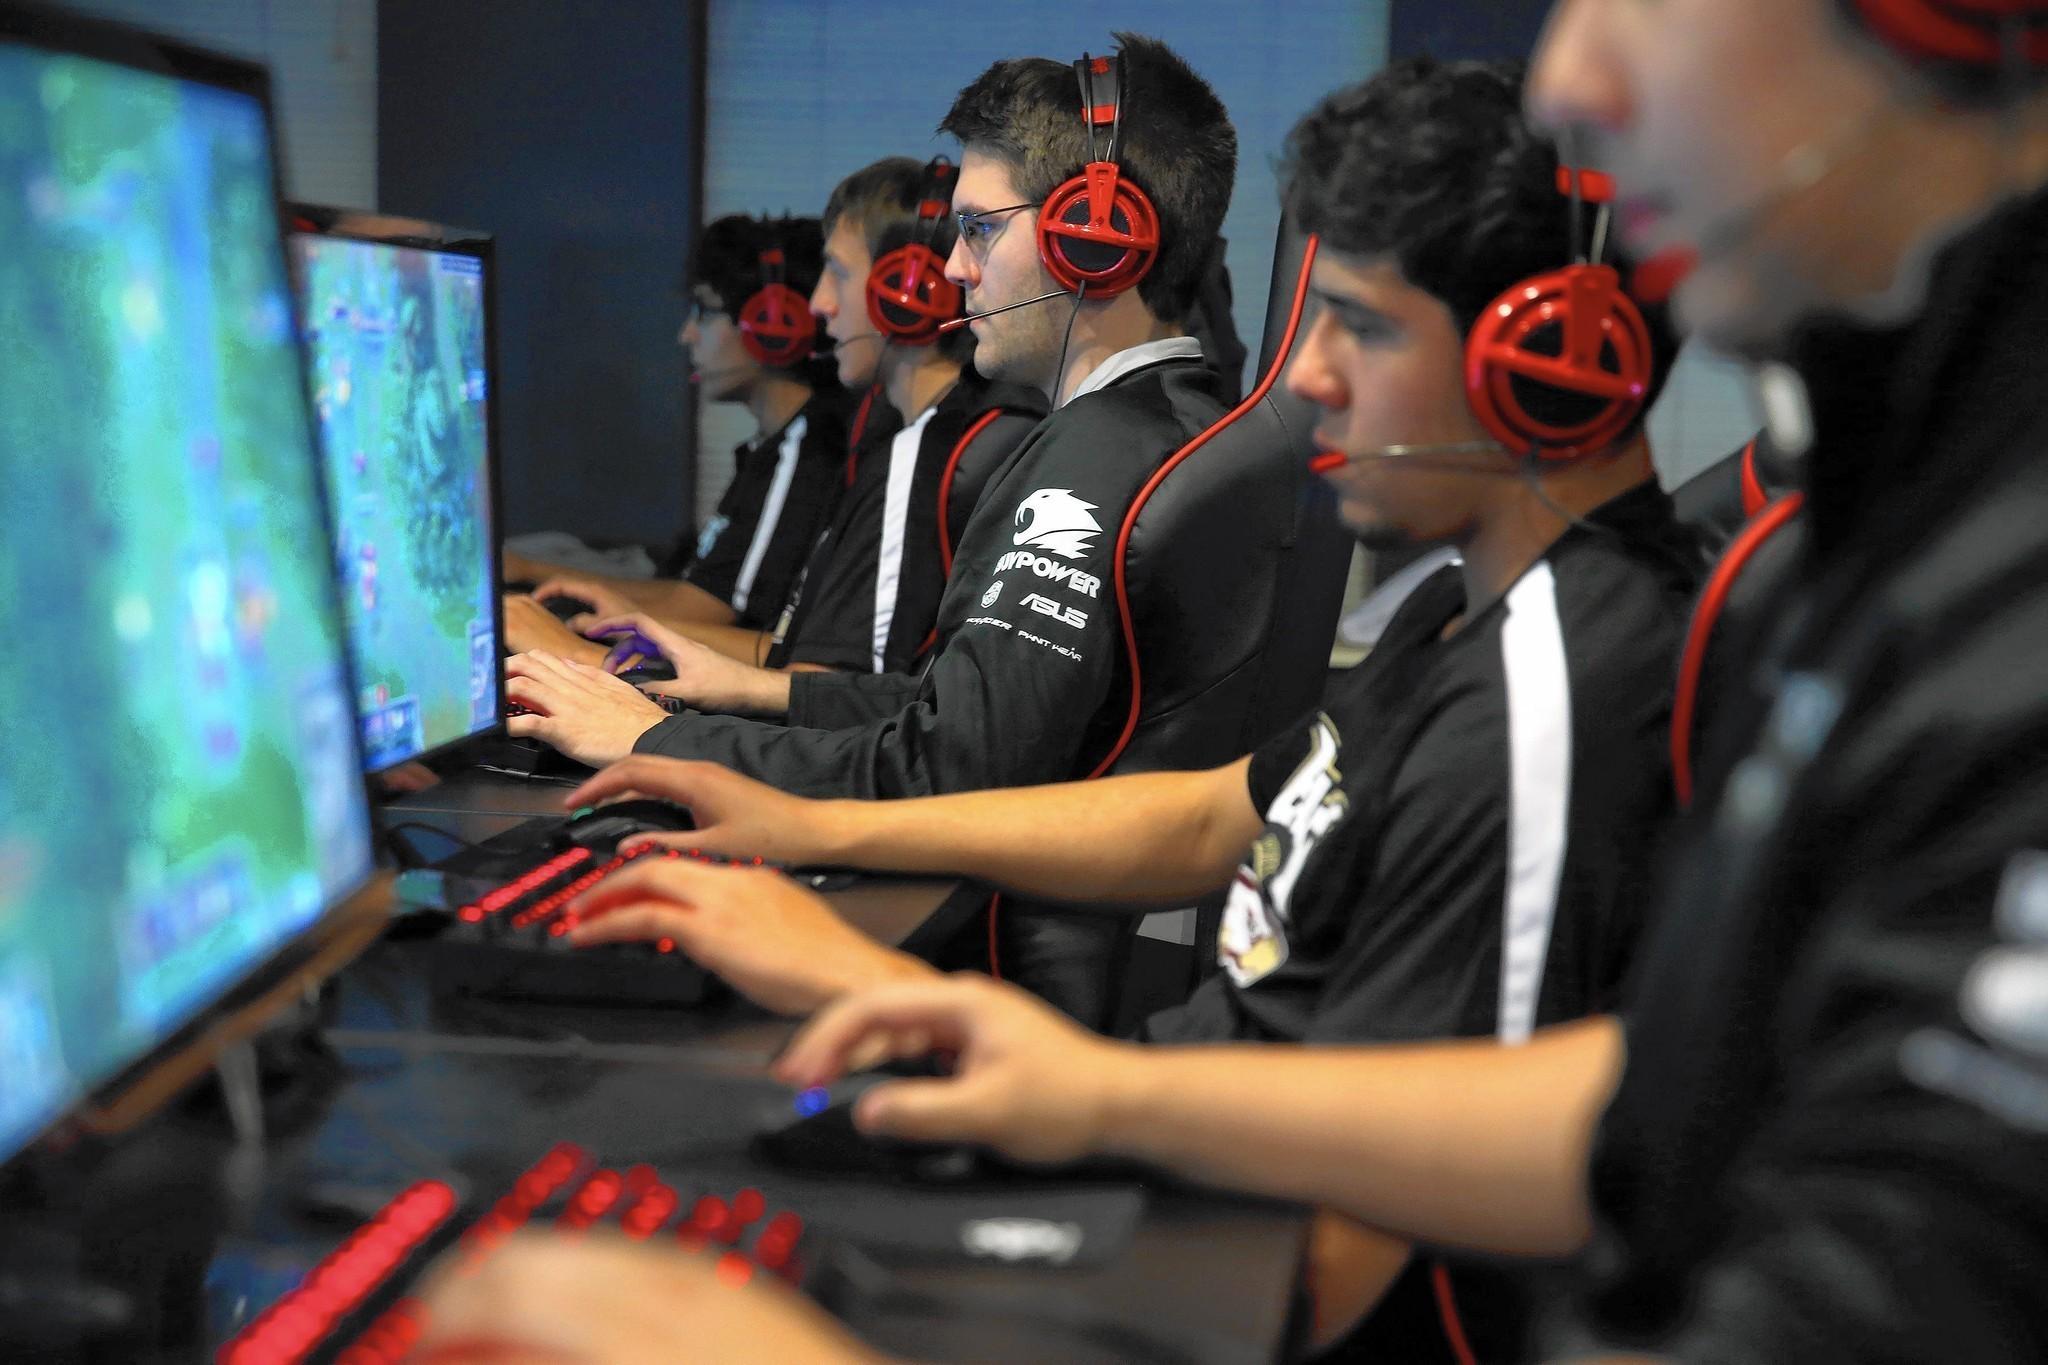 ct-robert-morris-video-game-championship-20150501